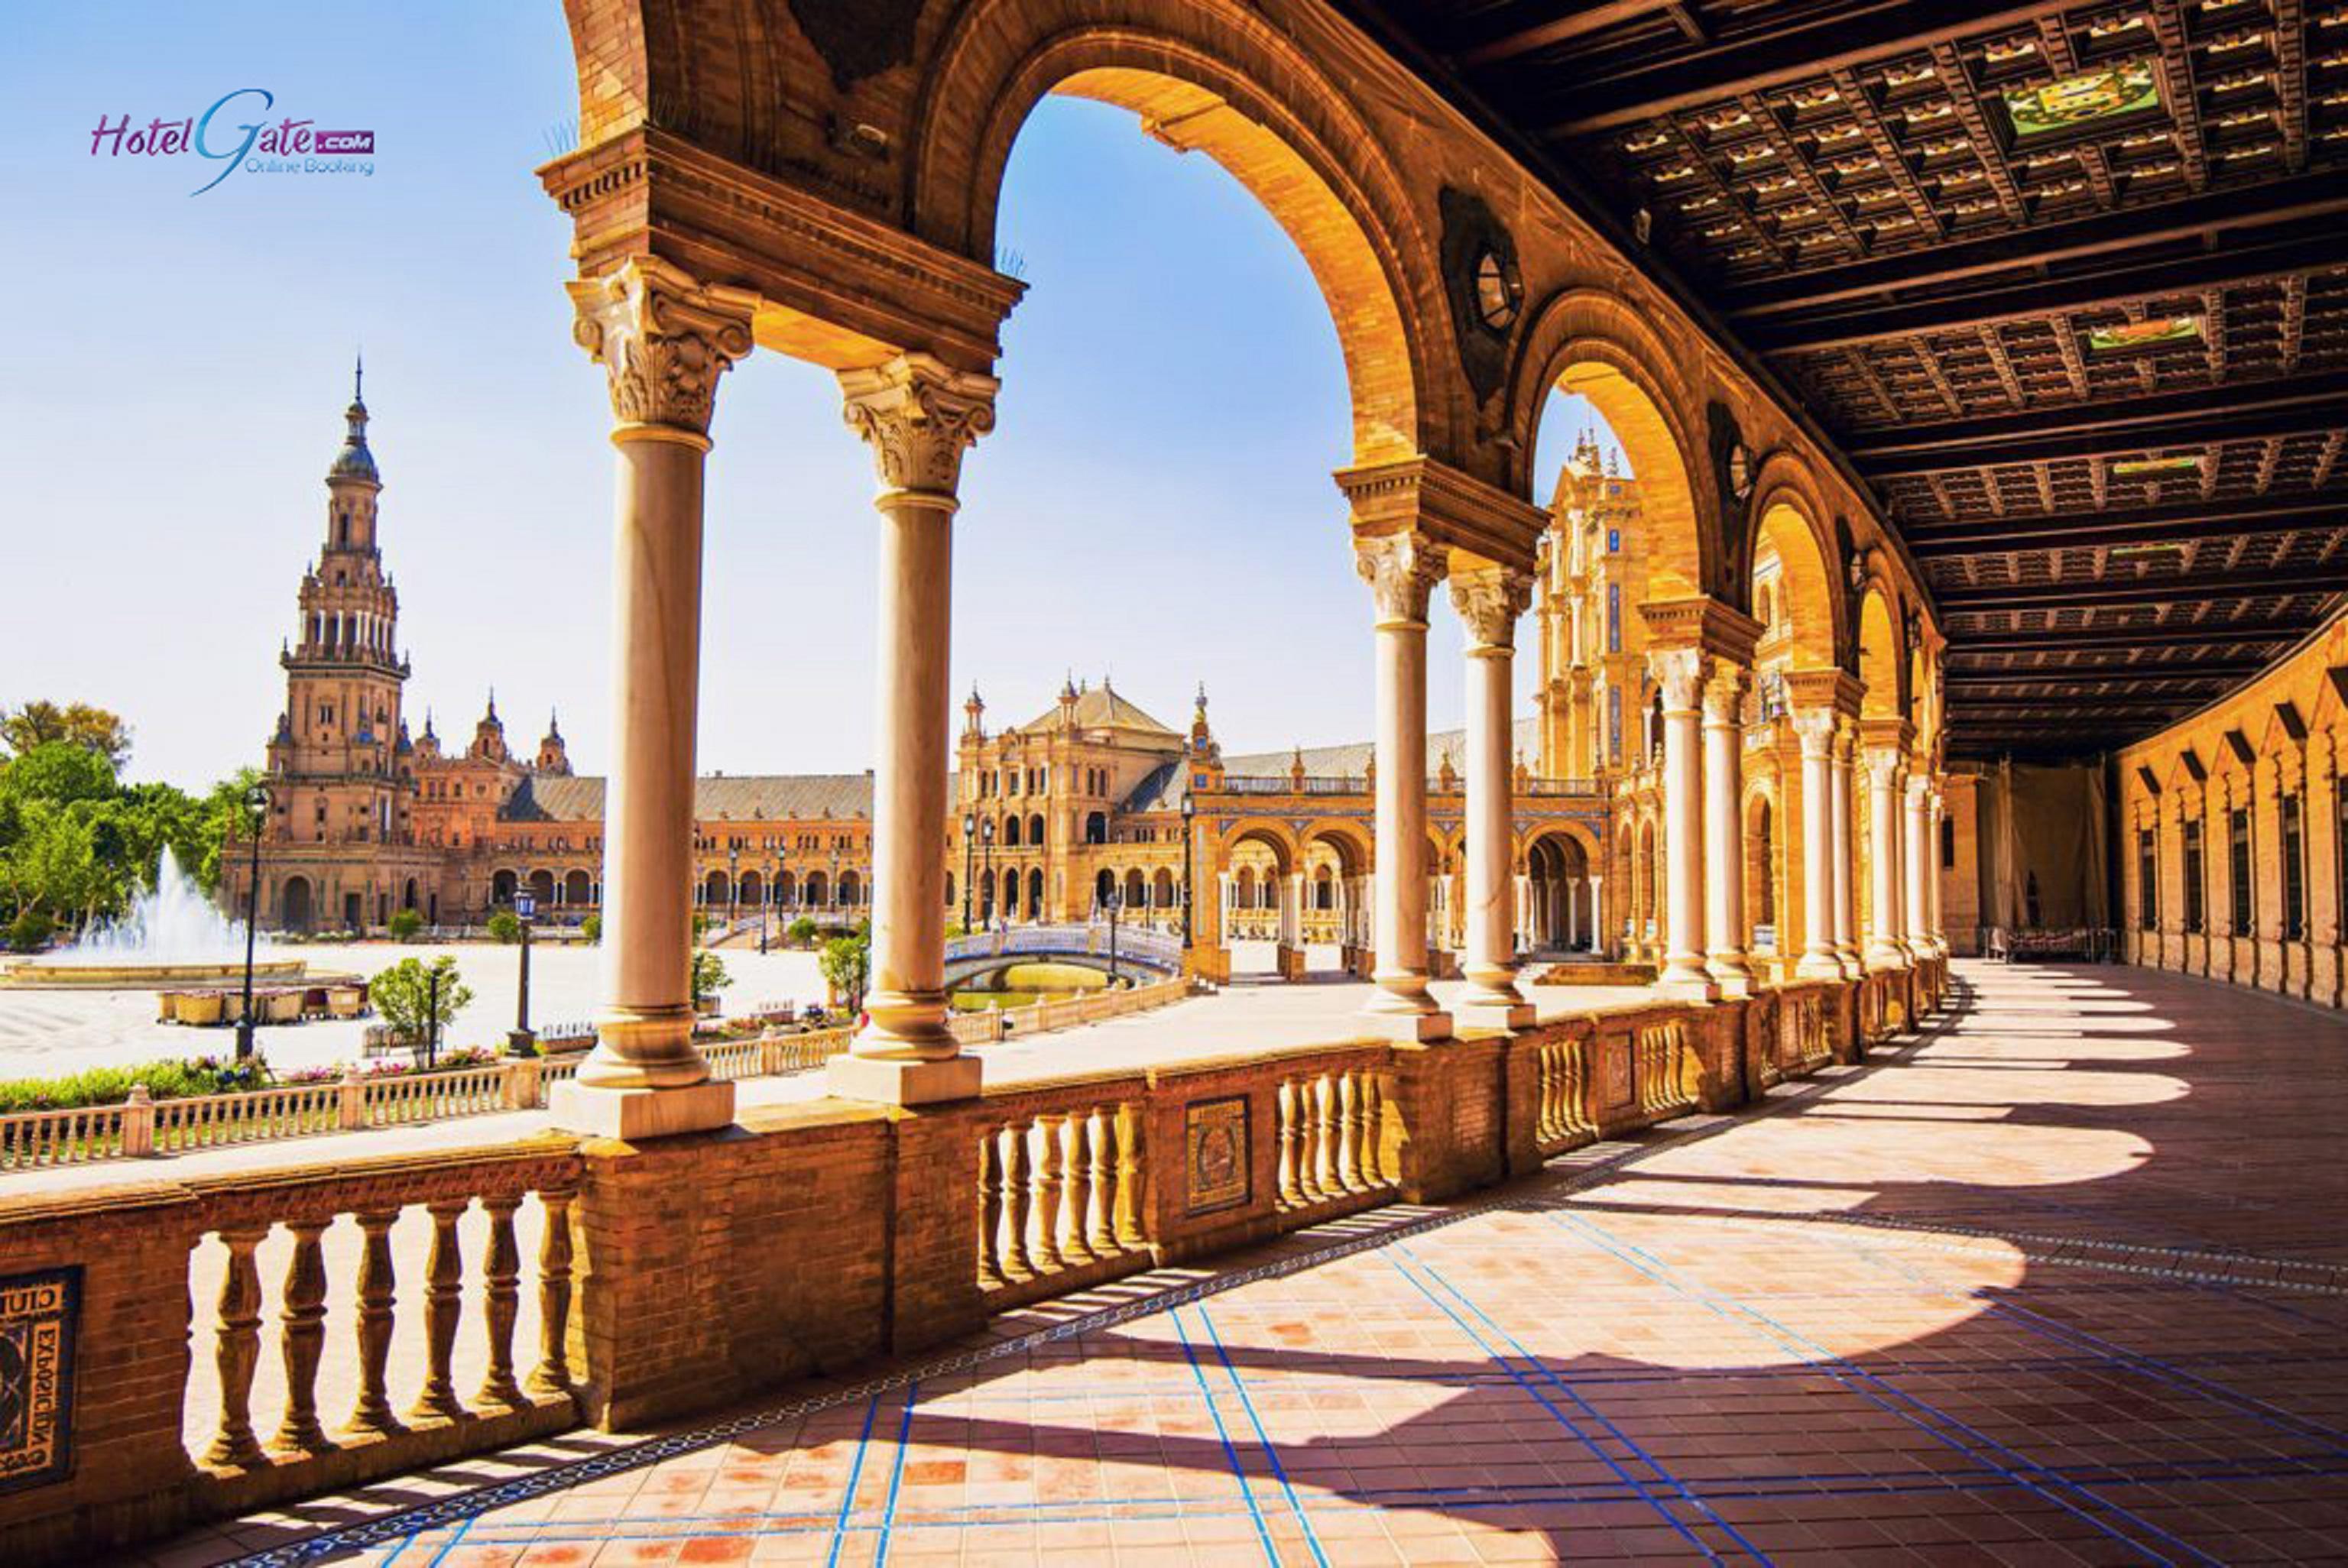 Free Images  Spain, Hotel, Landmark, Historic Site, Plaza -8709